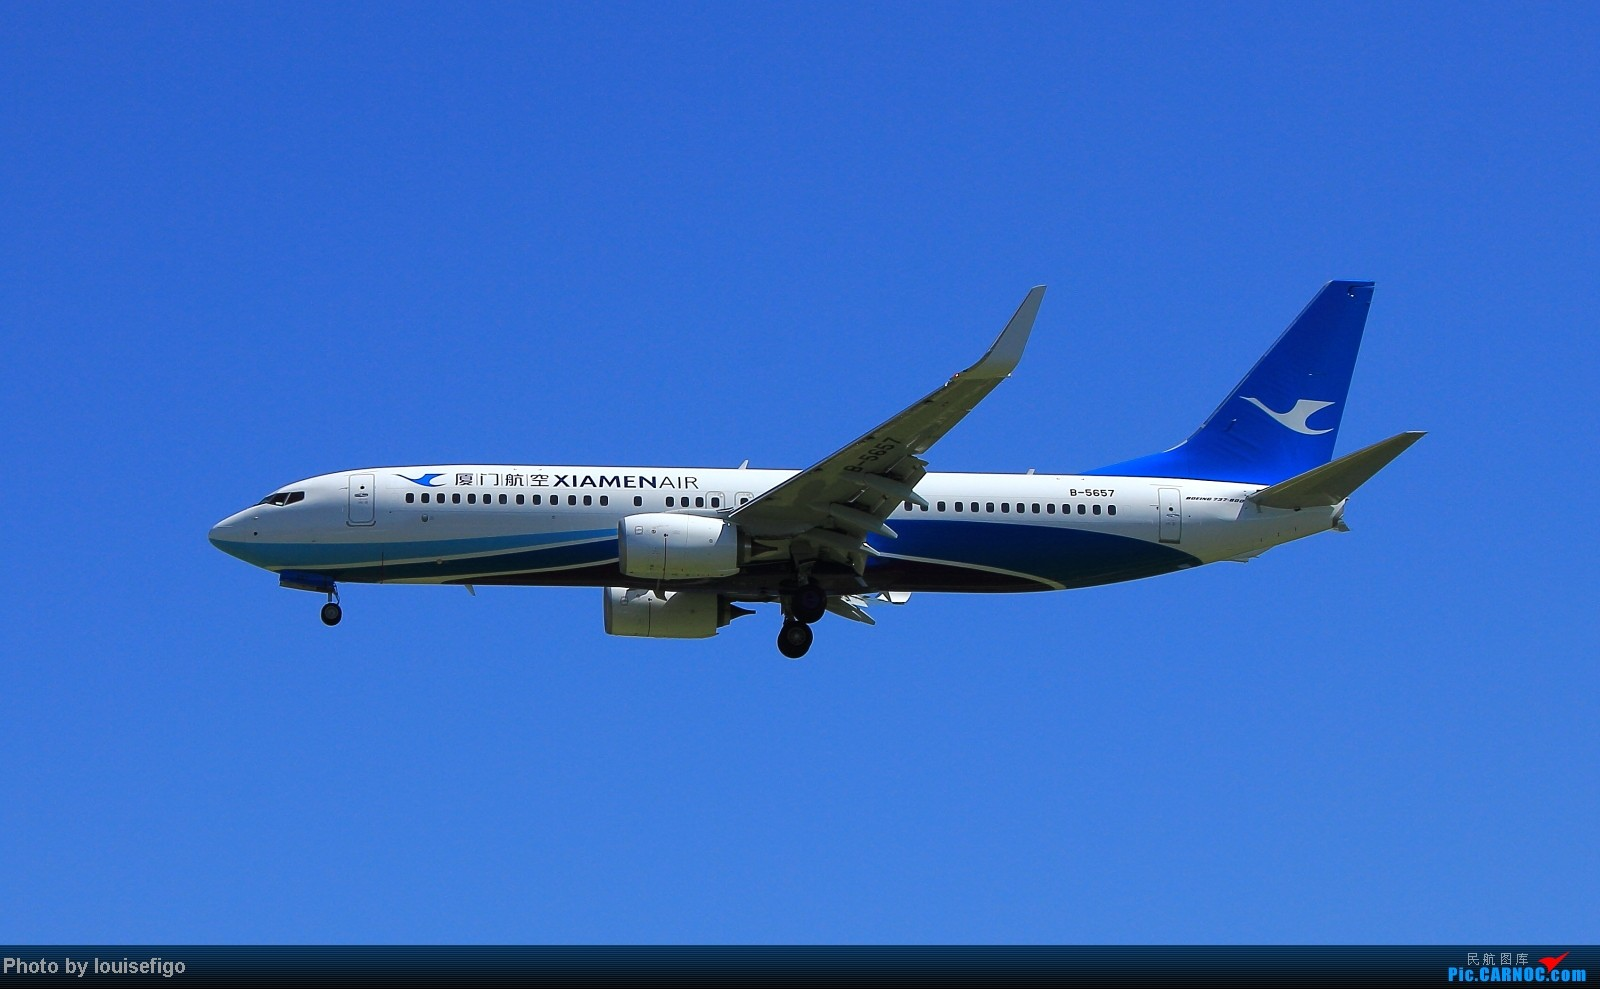 Re:[原创]秋高气爽得蓝天,厦门天鹅小清新!~~~~~~新装厦航飞在PEK! BOEING 737-800 B-5657 北京首都国际机场